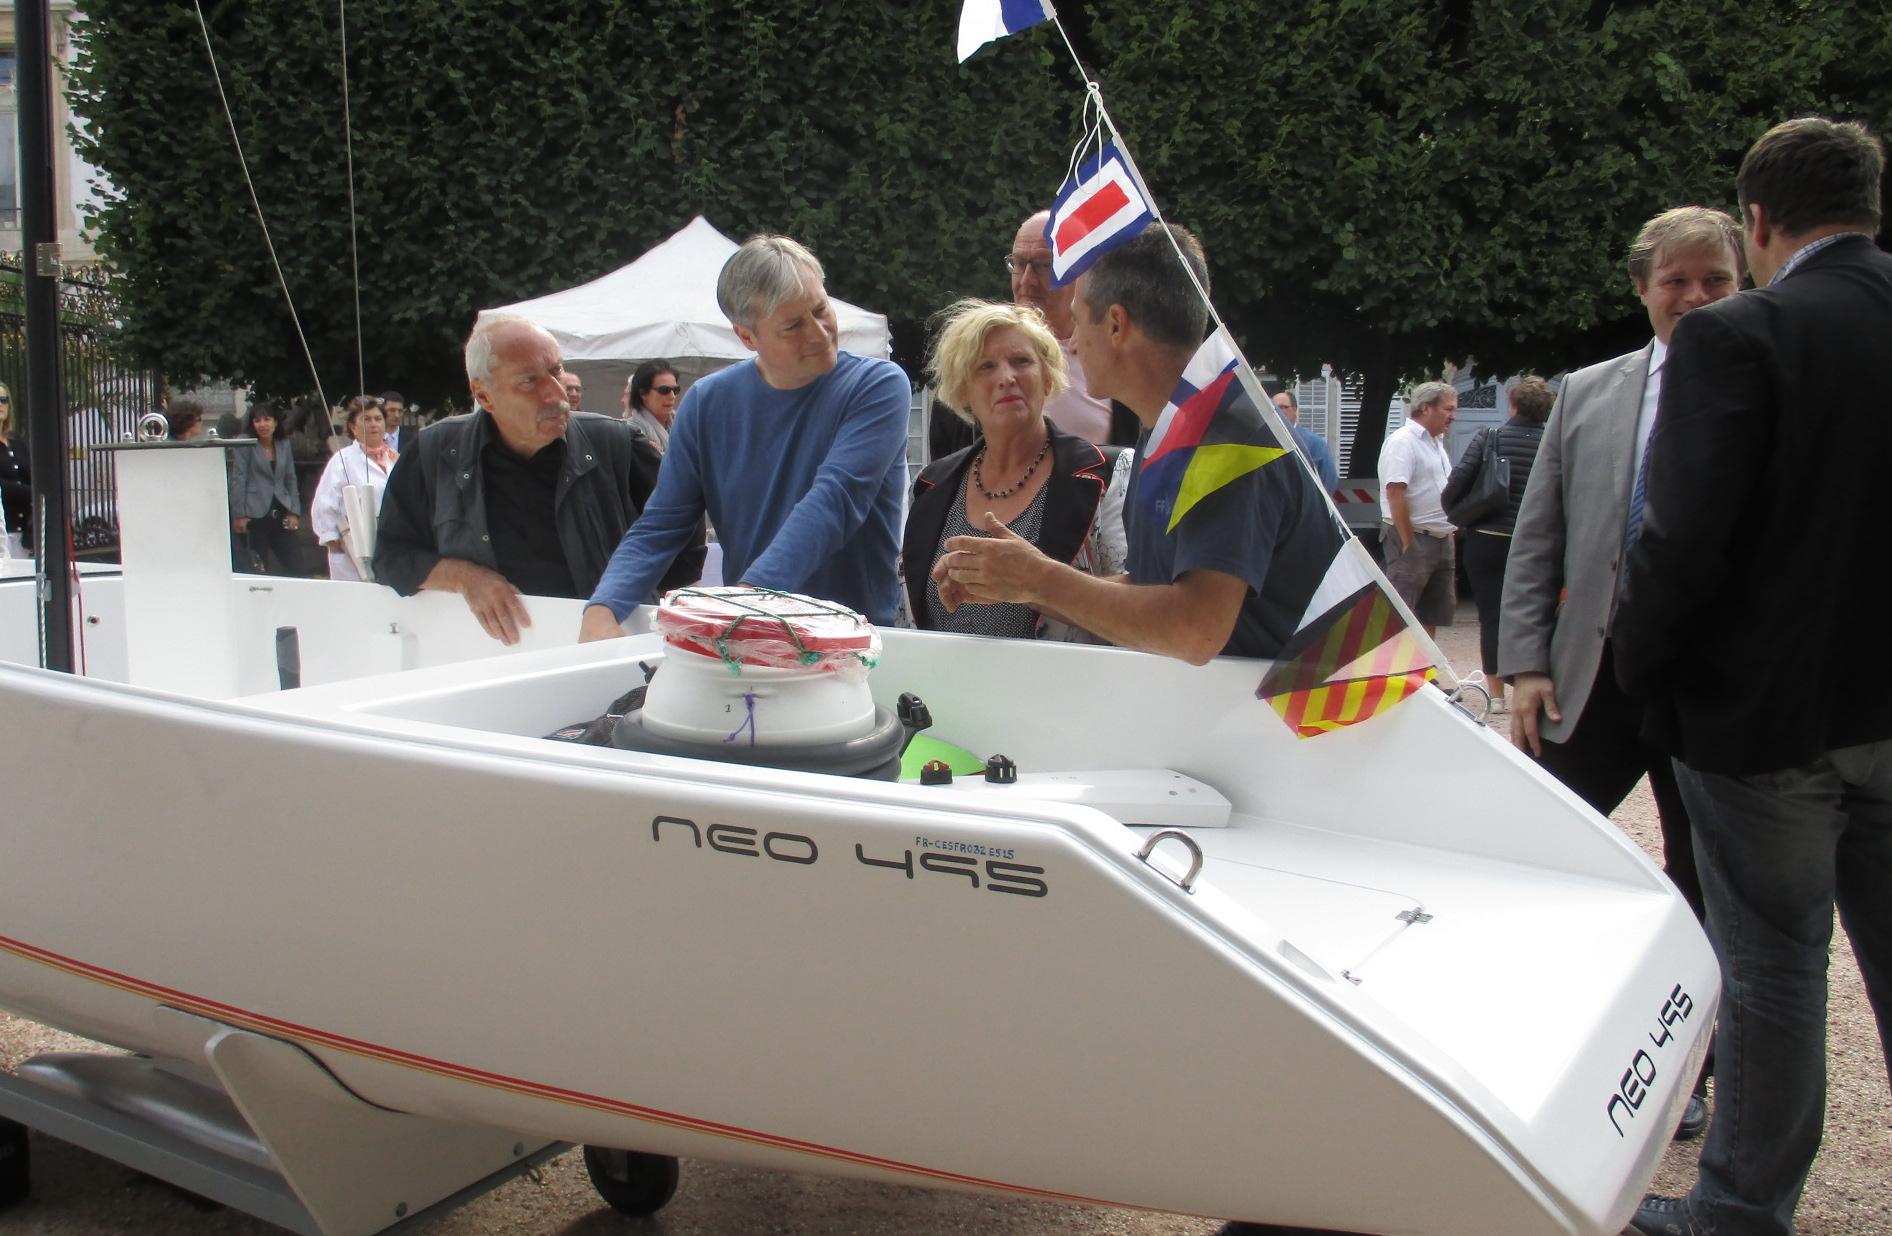 Inauguration neo495 L. Henart, , H Peccard, D Lemoine